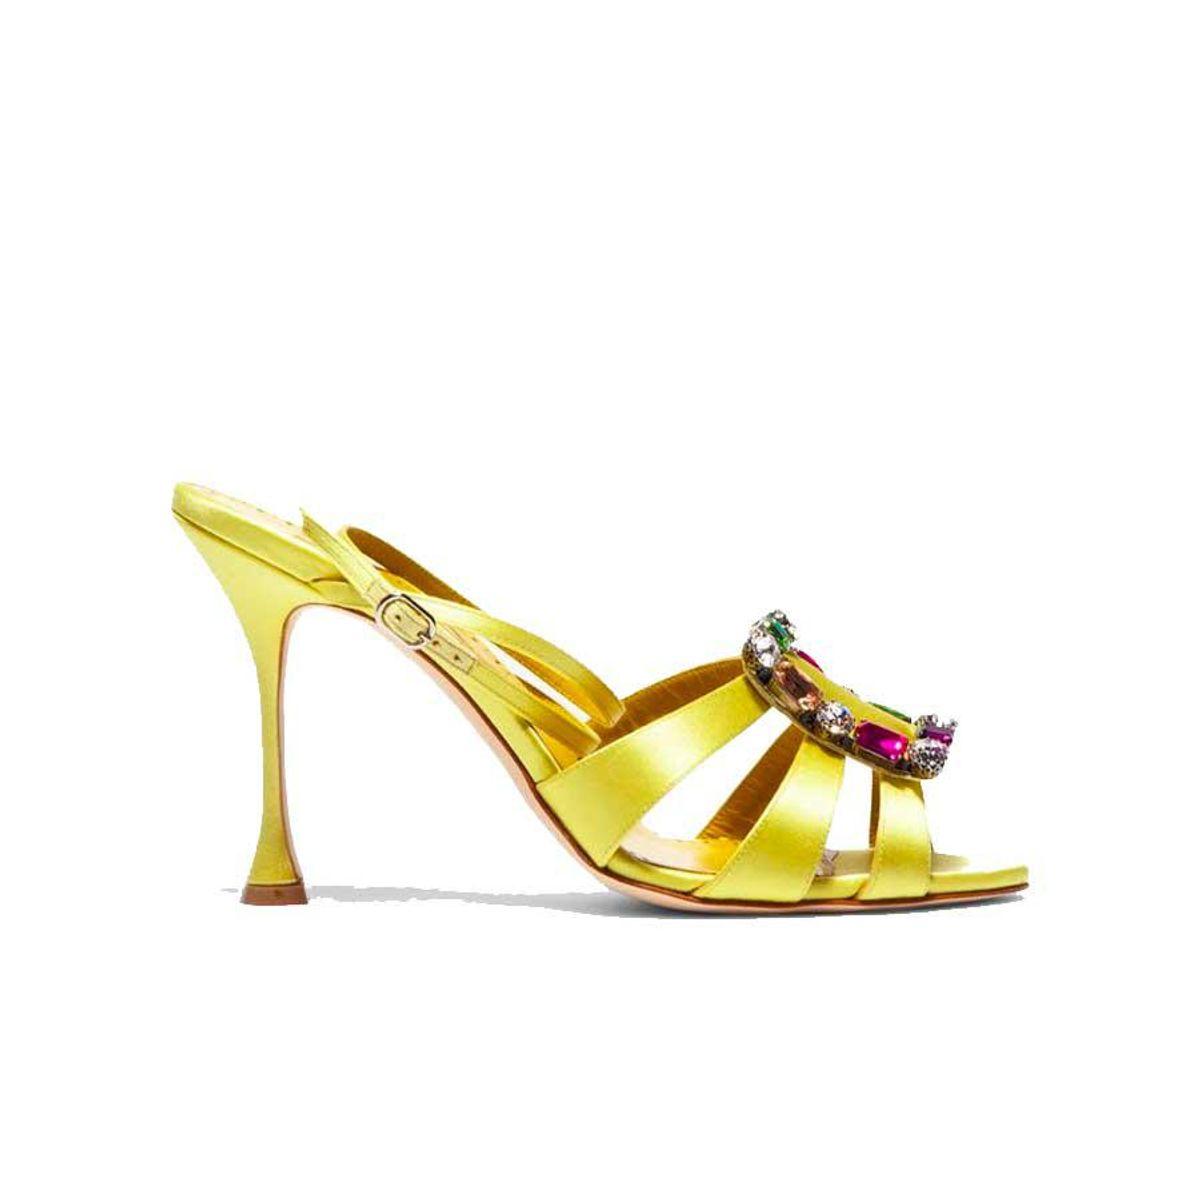 manolo blahnik centina 105 sandals